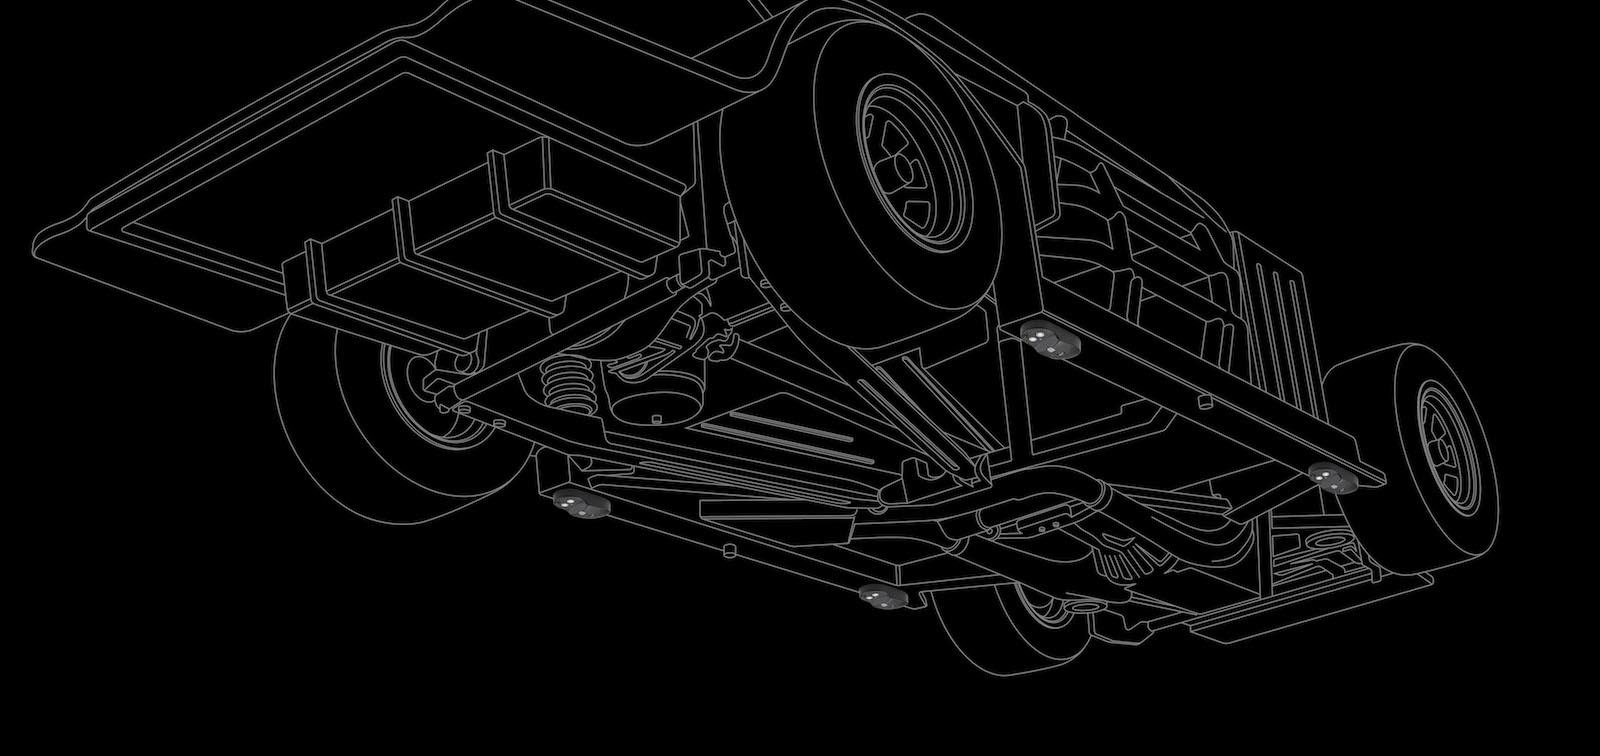 CHMS chassis_art